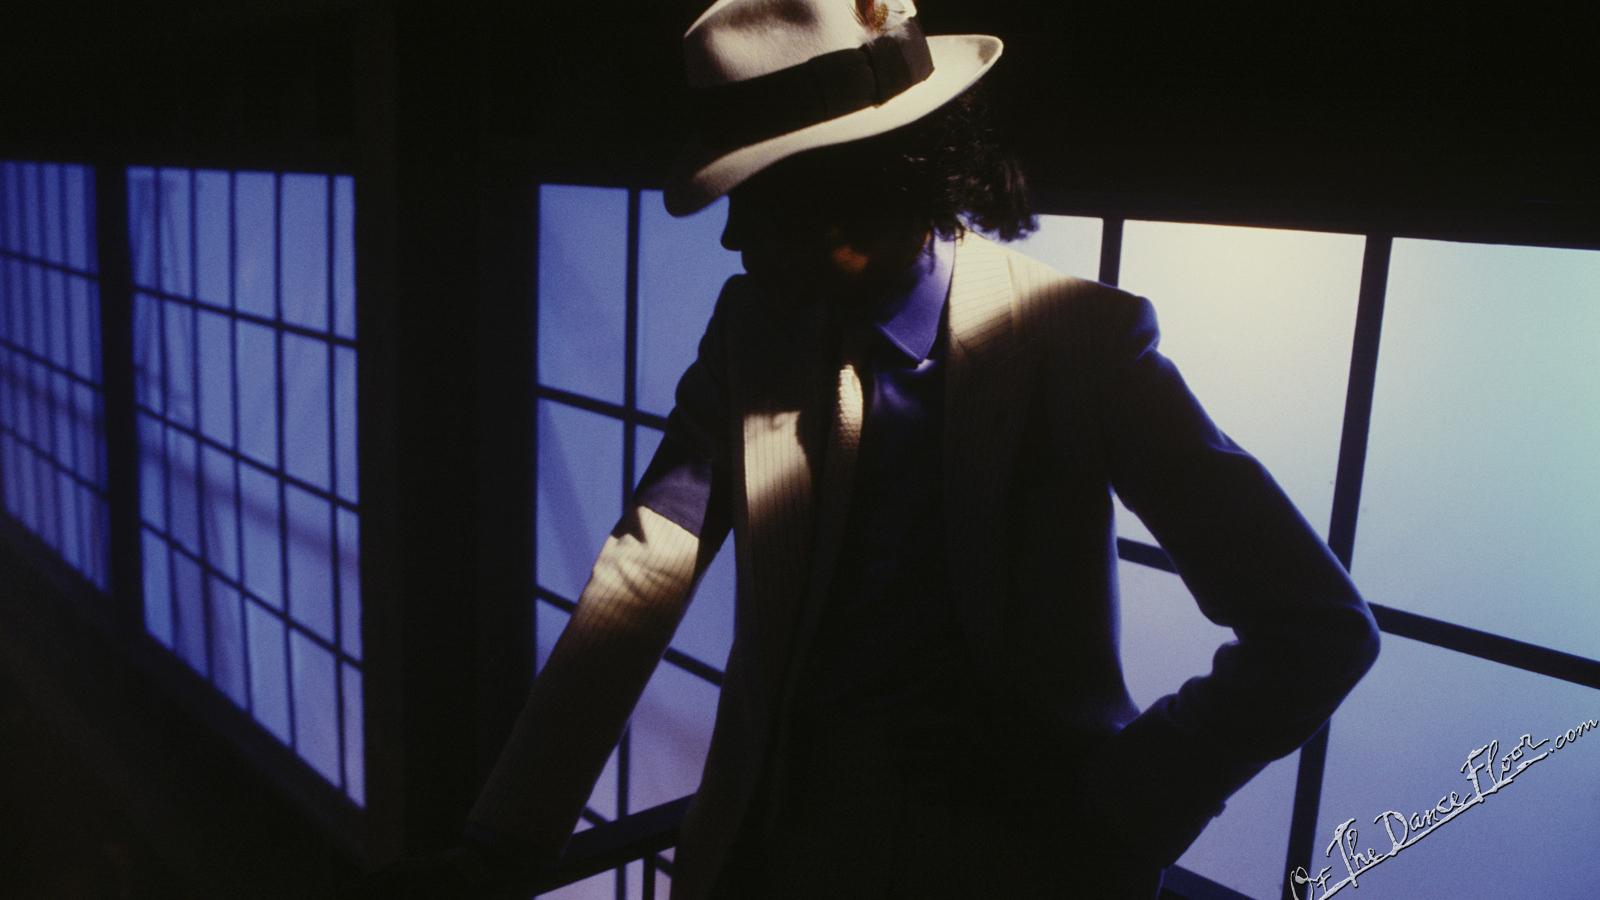 Free Download Michael Jackson Images Smooth Criminal Wallpaper